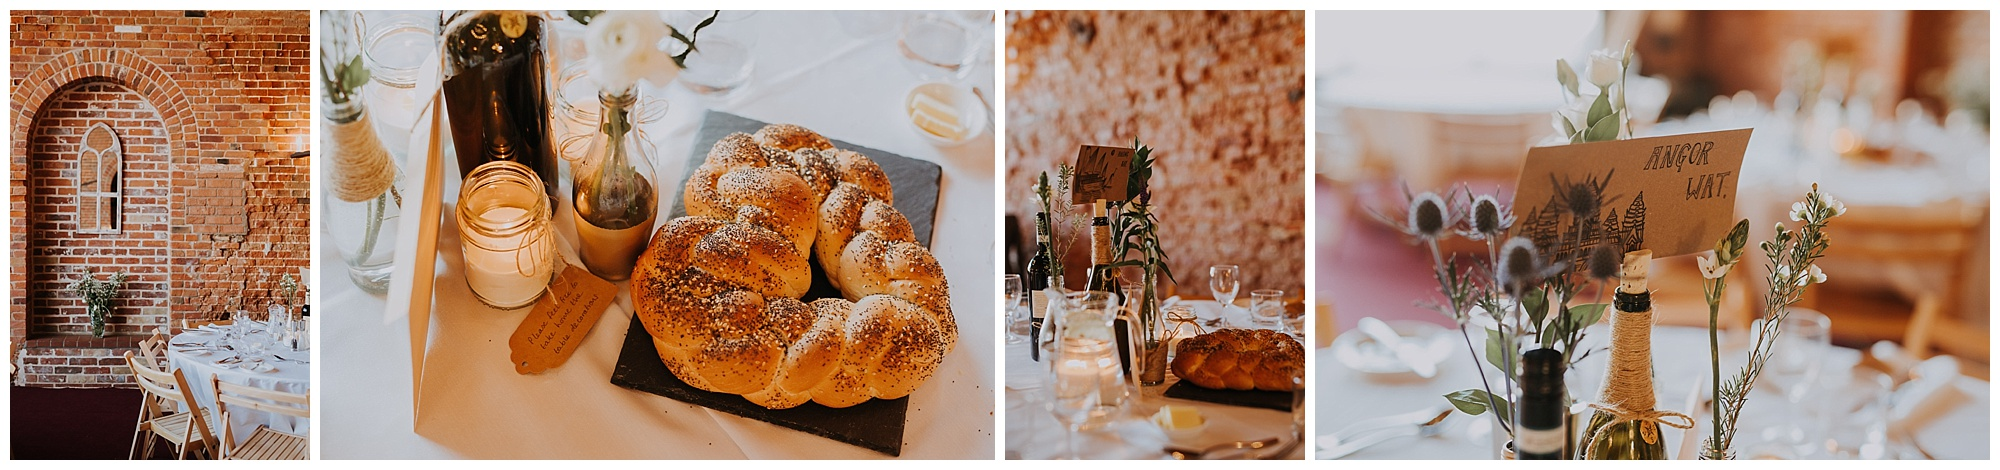 details including fresh bread